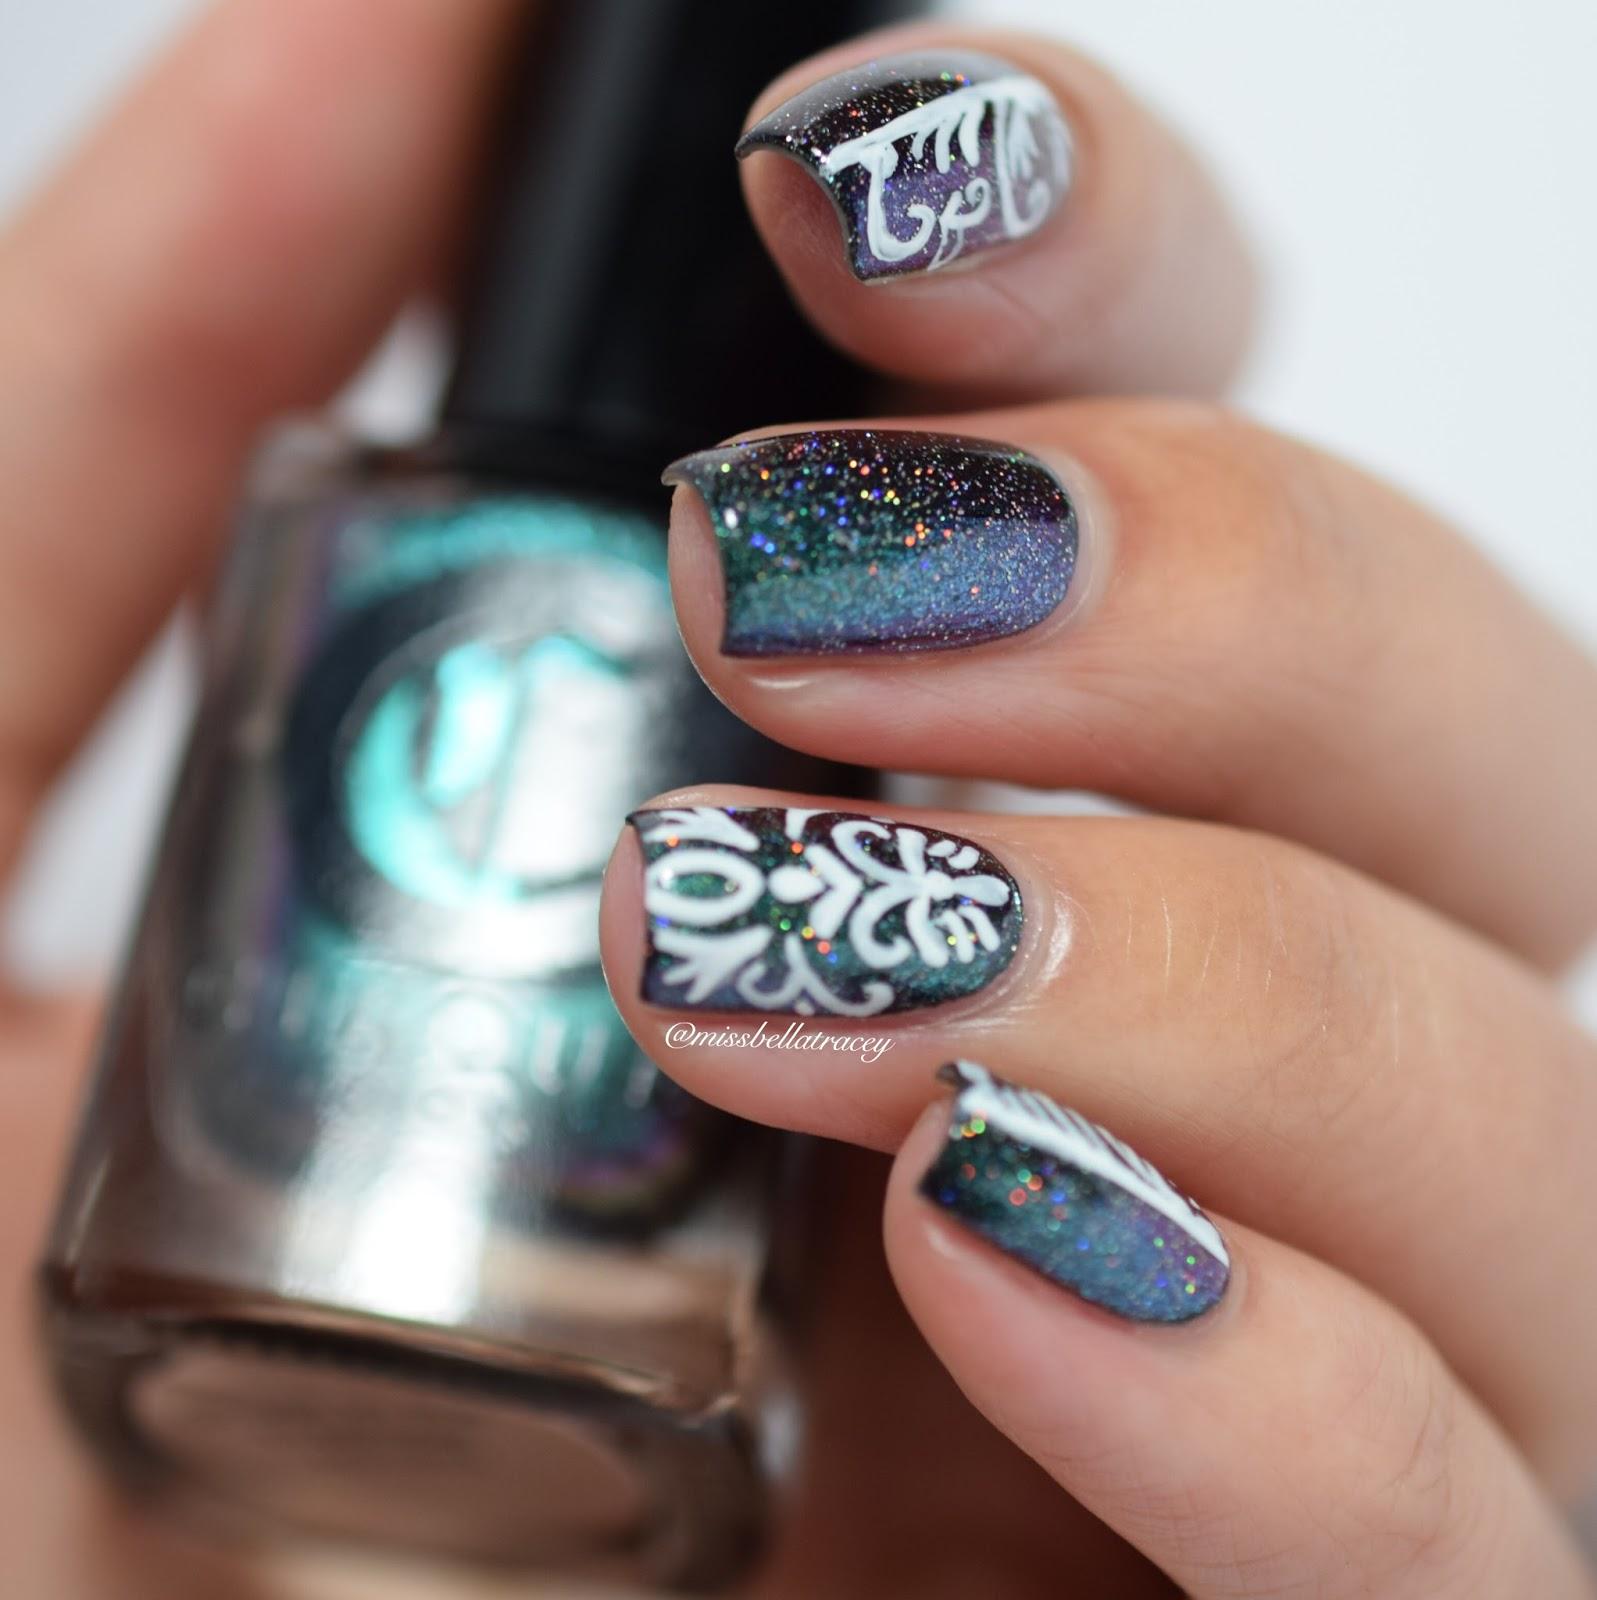 MissBellaTracey: WNAC - Holo Damask Nail Art - BTN